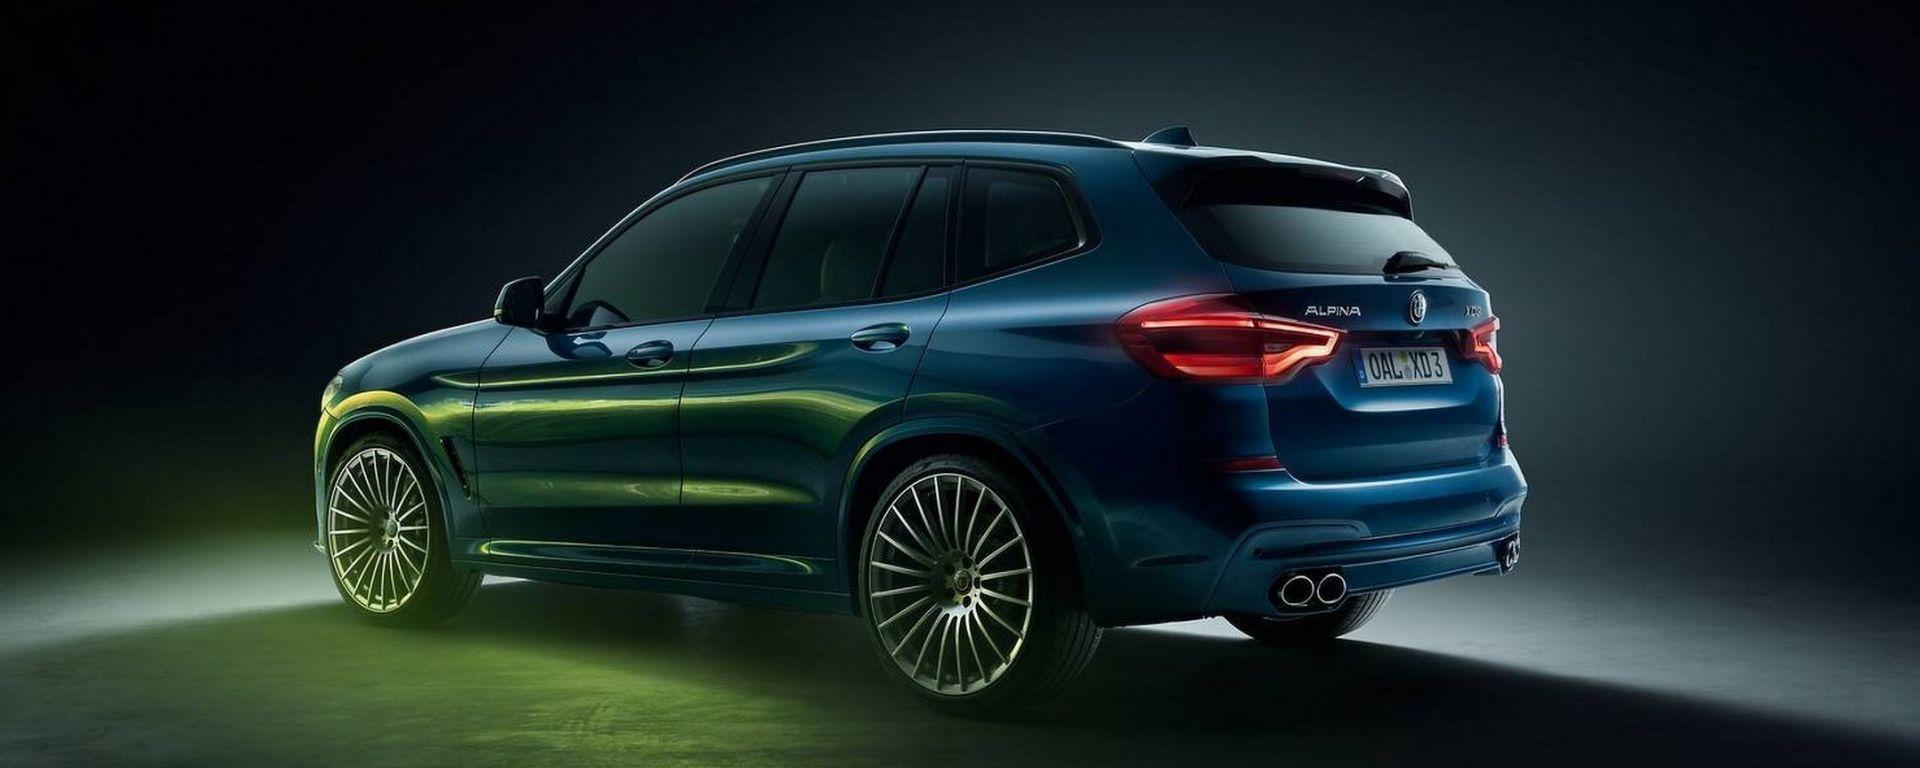 Alpina XD3: SUV Diesel dall'animo sportivo